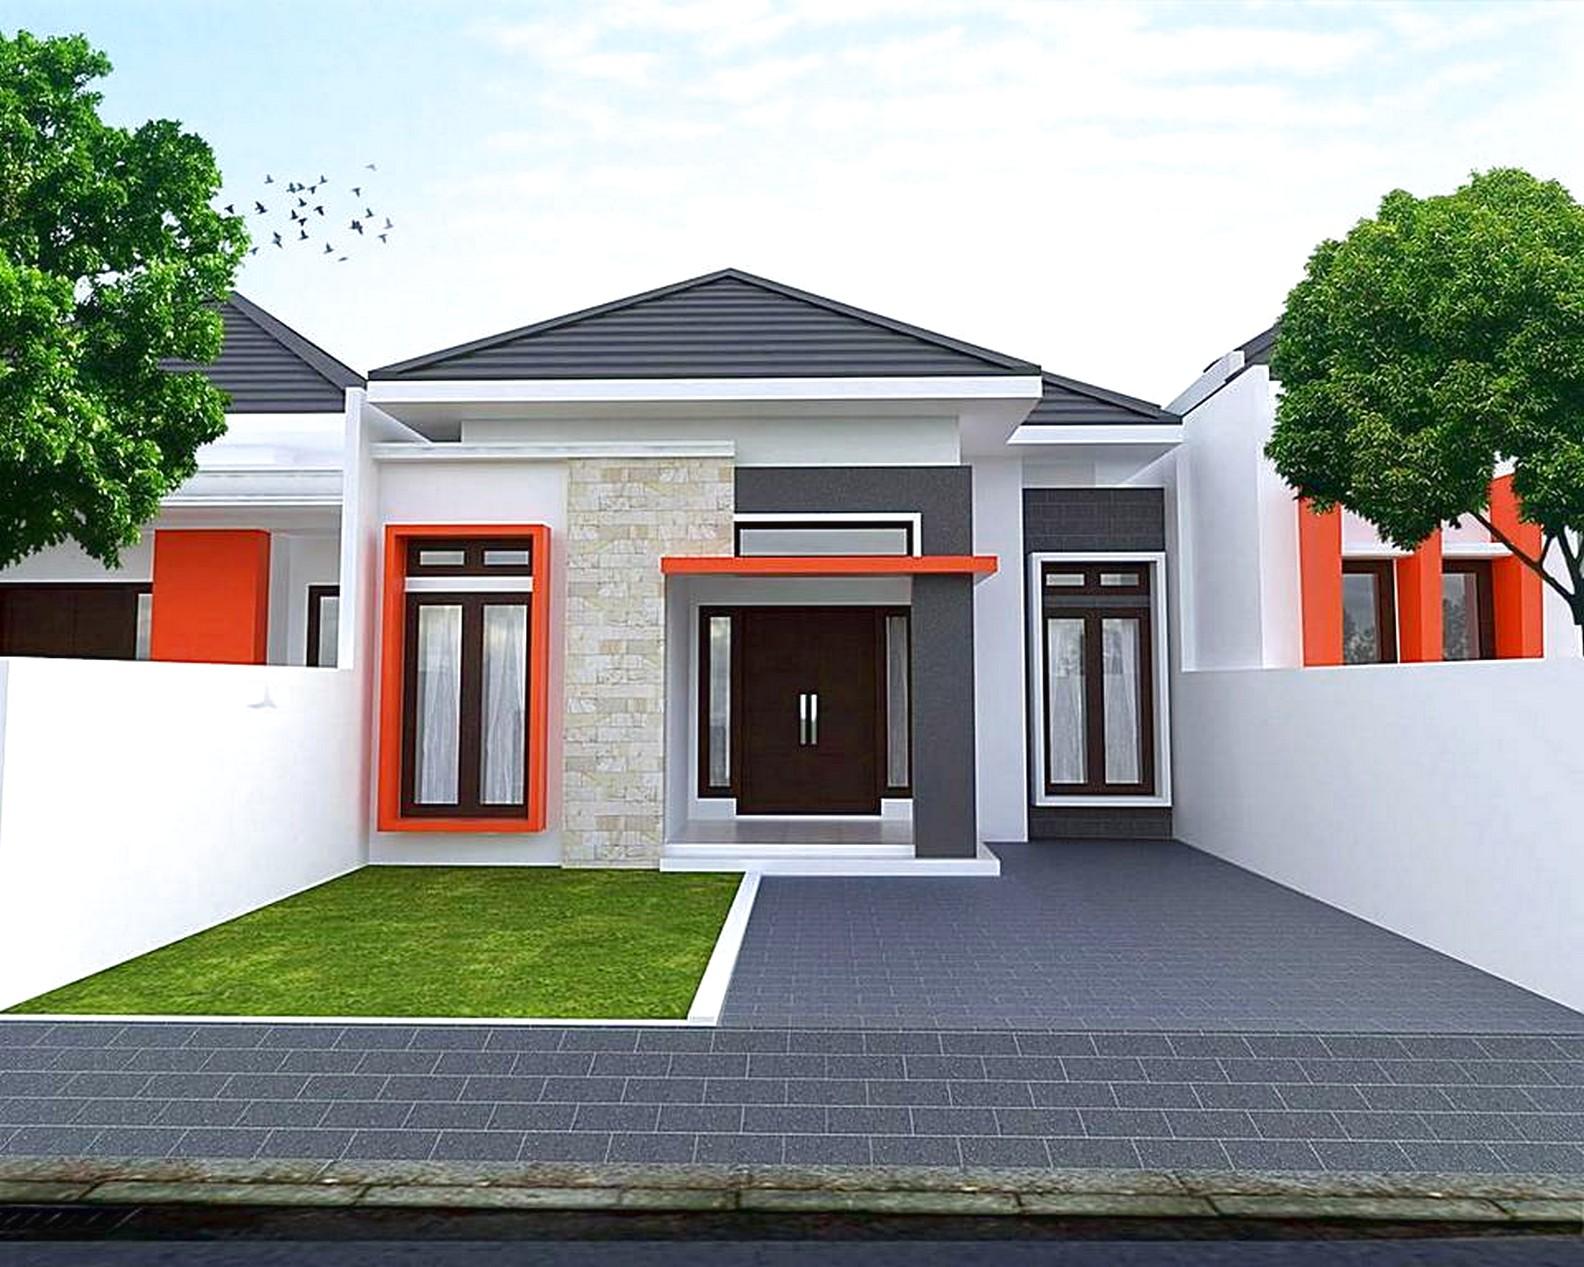 Rumah Minimalis 2018 1 Lantai Folder Rumah Minimalis